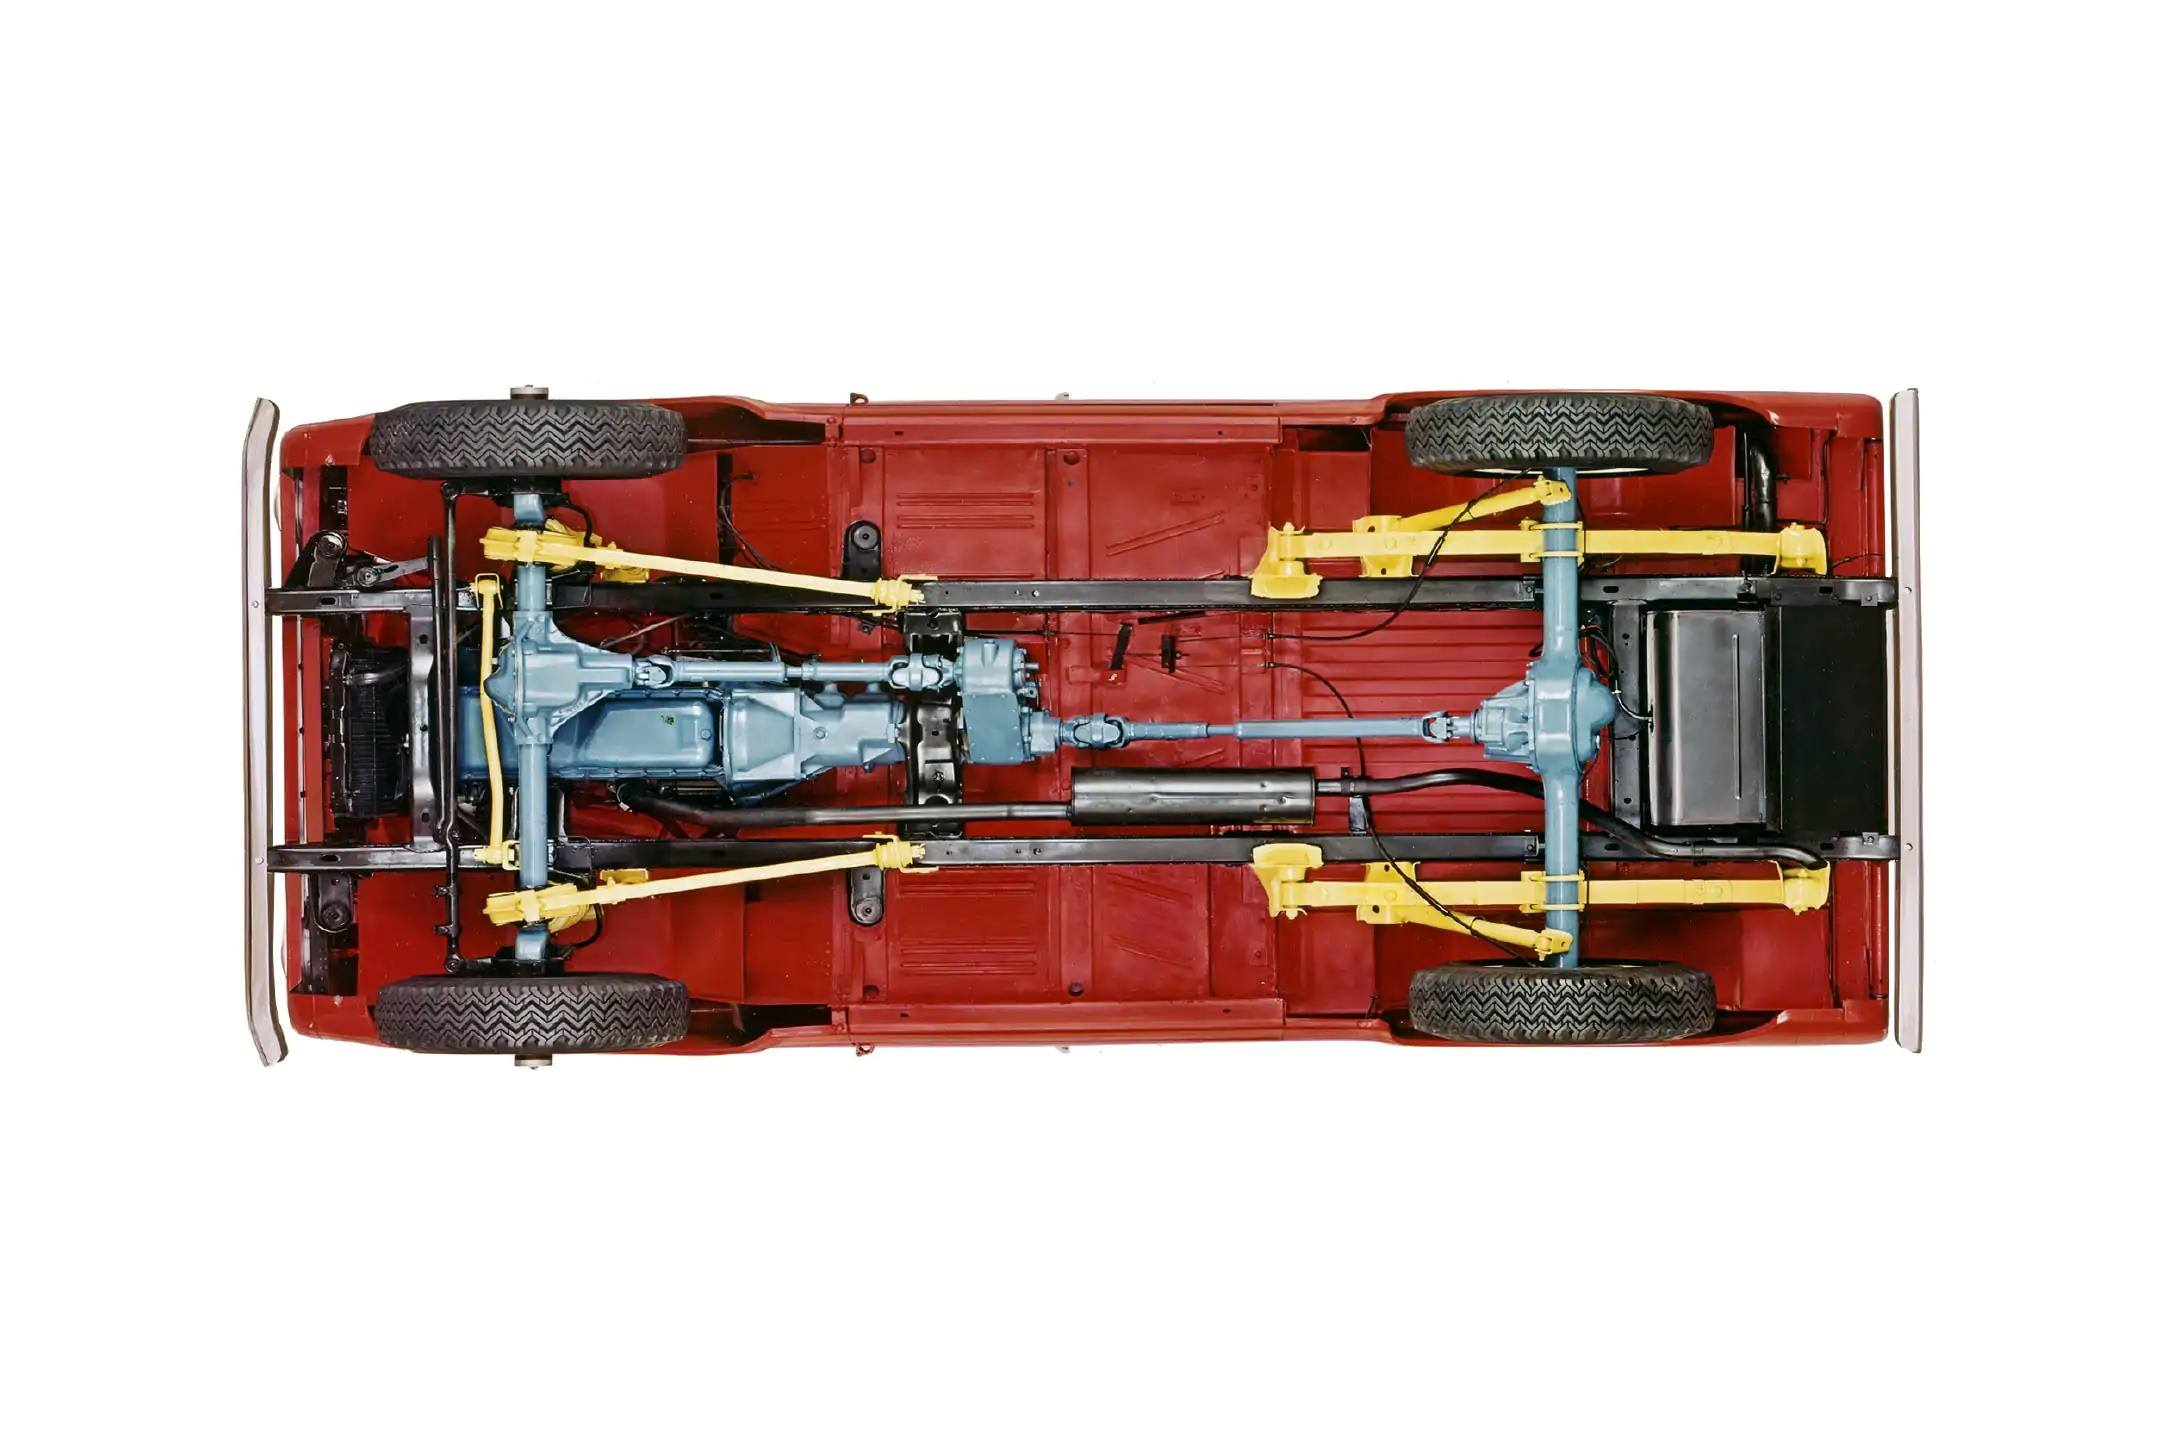 bronco-design-gen01-1967-suspension